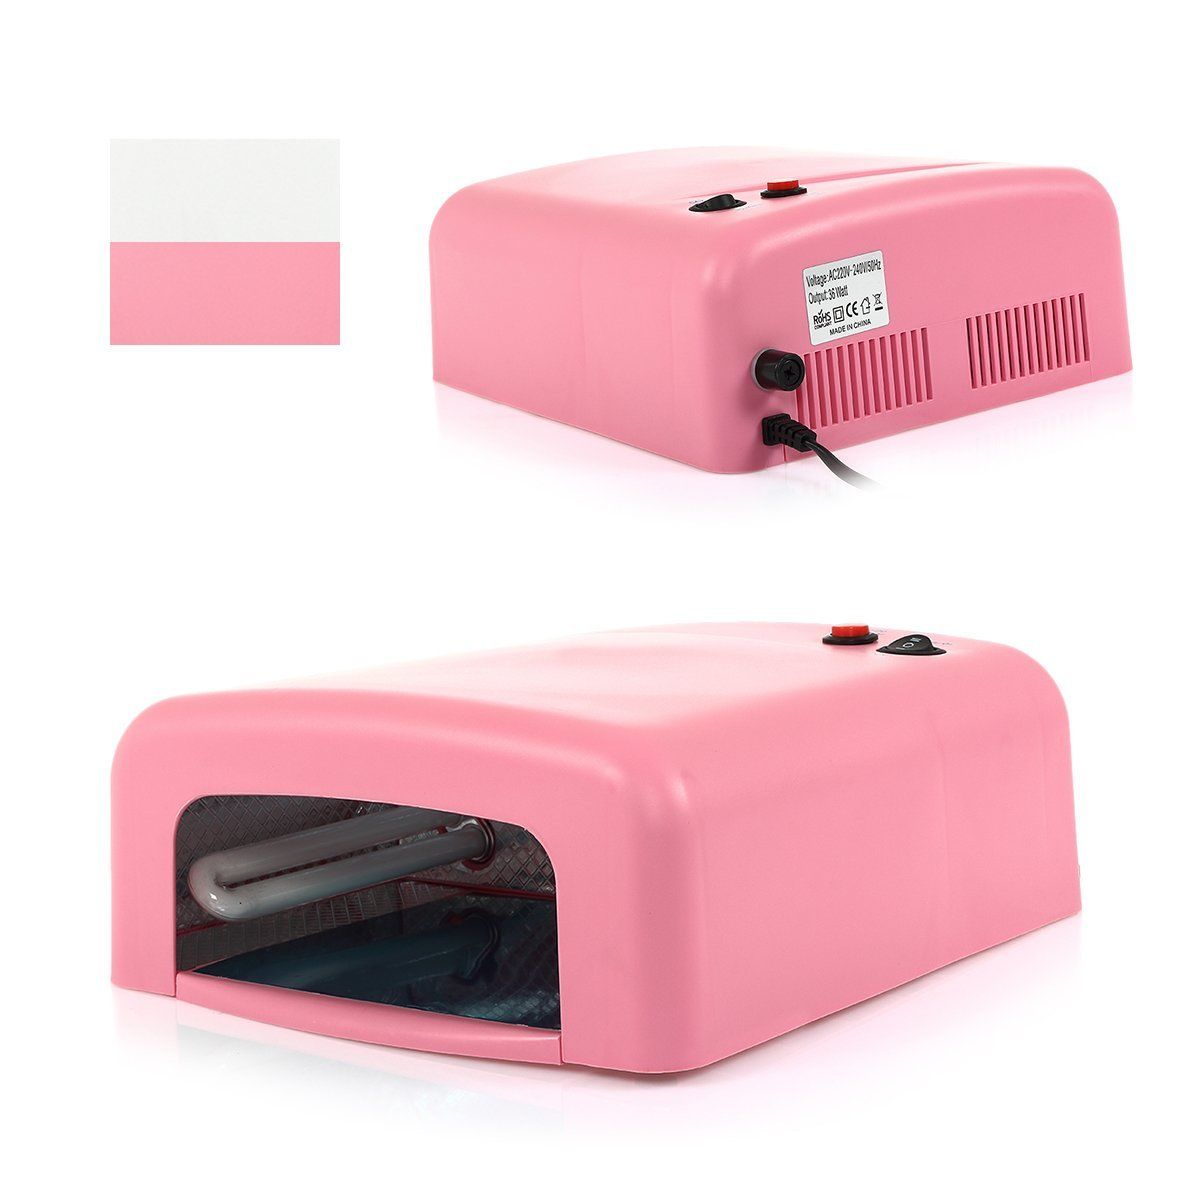 Nail Dryer Light: New 36W /9W Pro Nail Dryer UV Lamp Salon Curing Polish